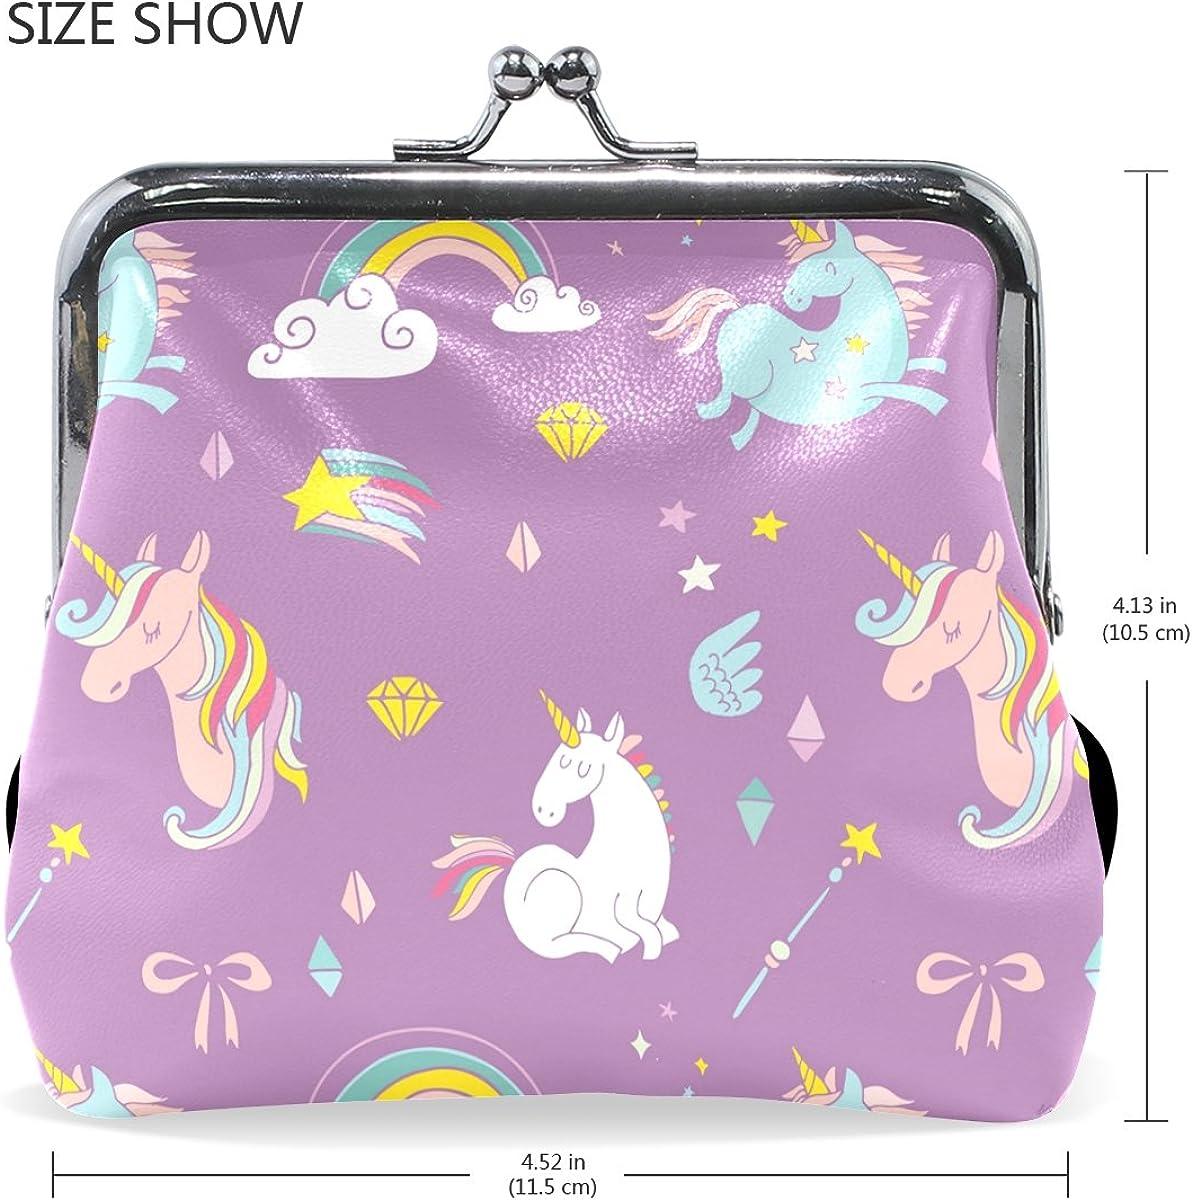 TIKISMILE Unicorn On Rainbow Leather Fashion Buckle Cute Coin Purse Bags Wallet